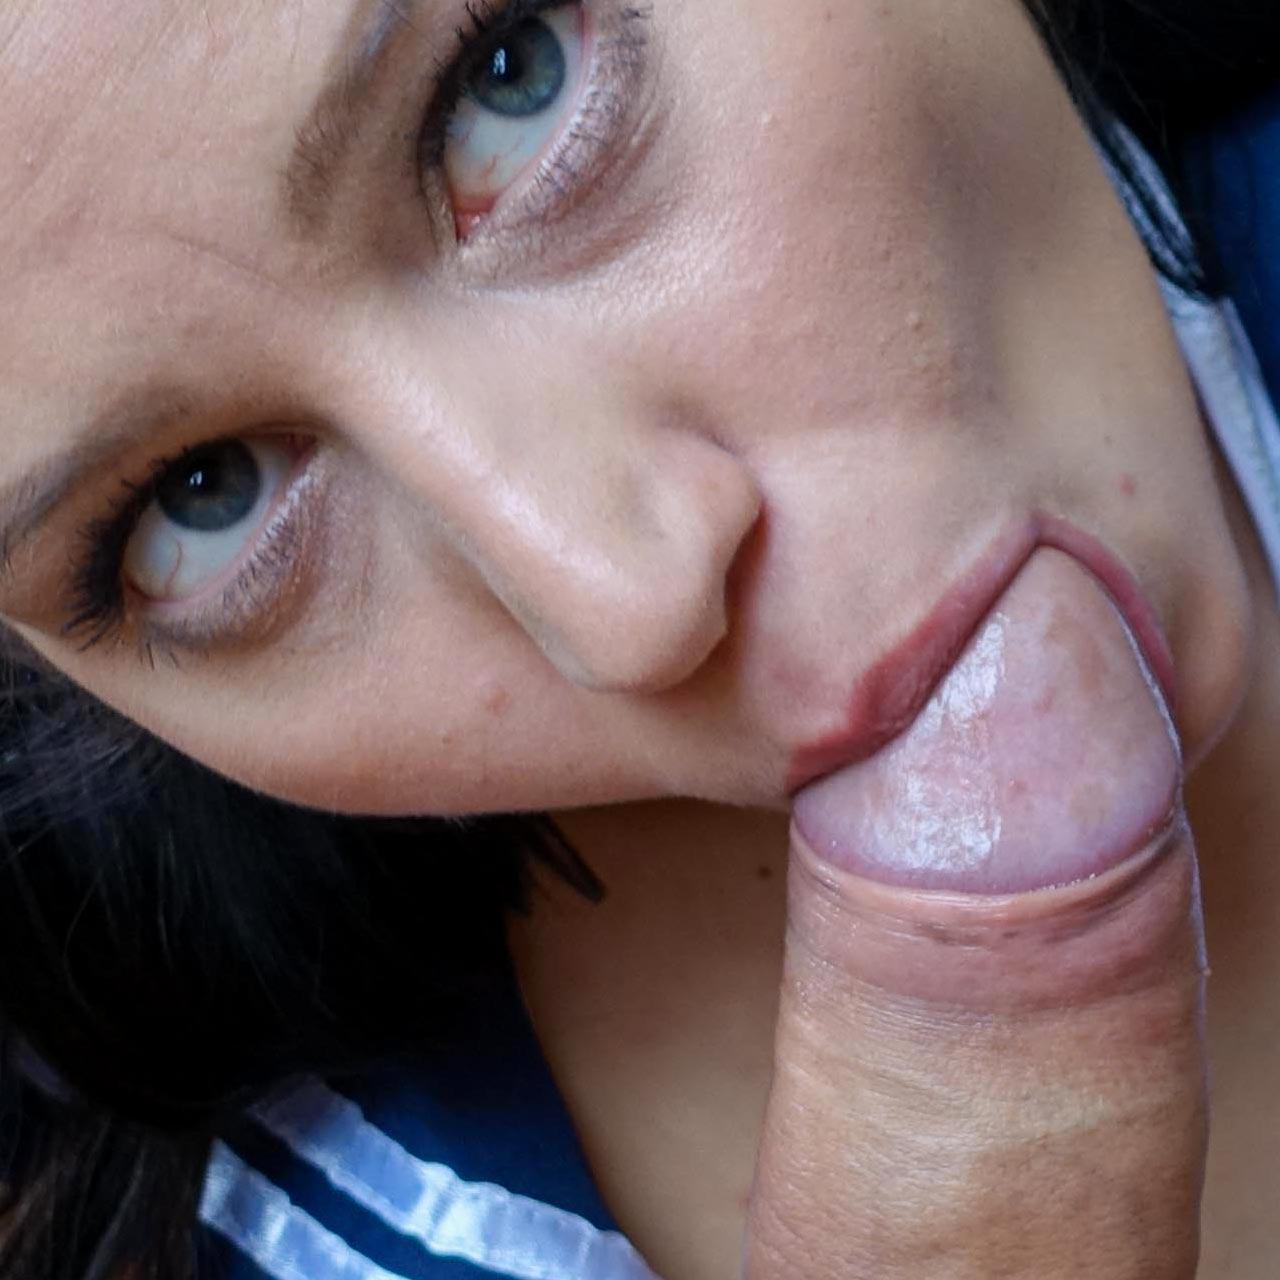 Cum Buffet, cock sucking Blowjob girls swallow sperm in uncensored cumbuffet videos. pictured: Emily Brix.